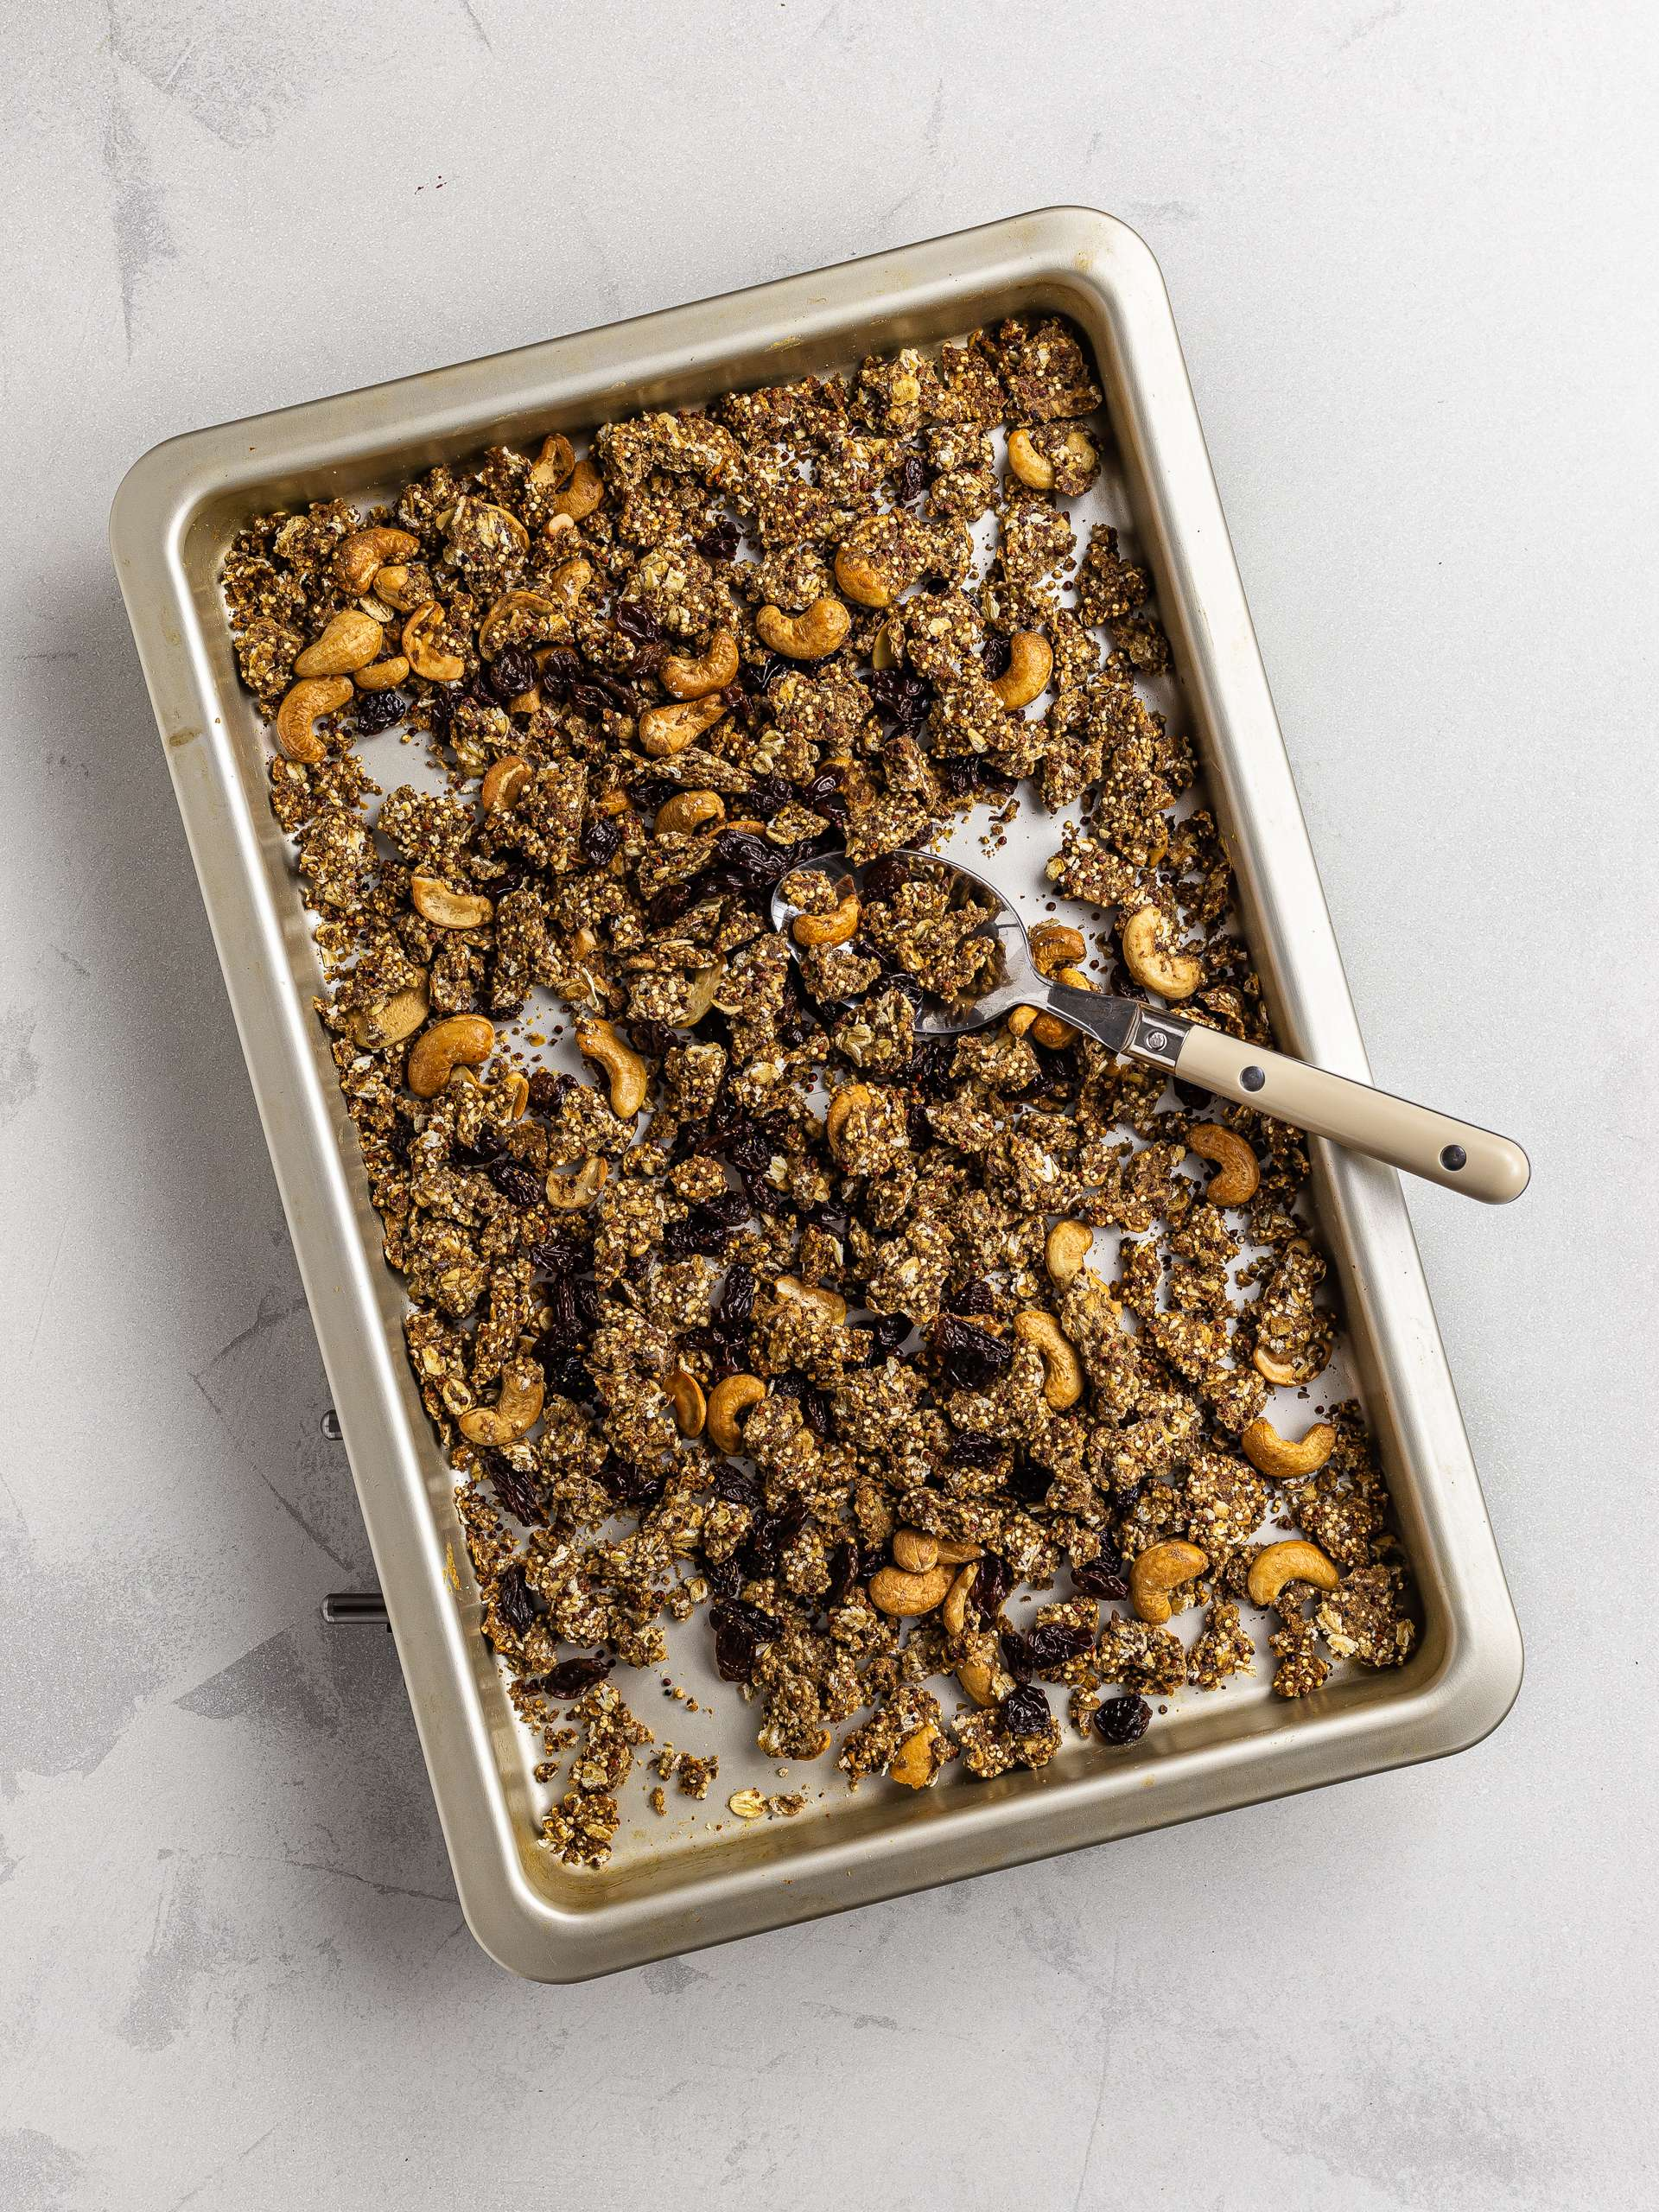 cashew granola with raisins on a baking tray